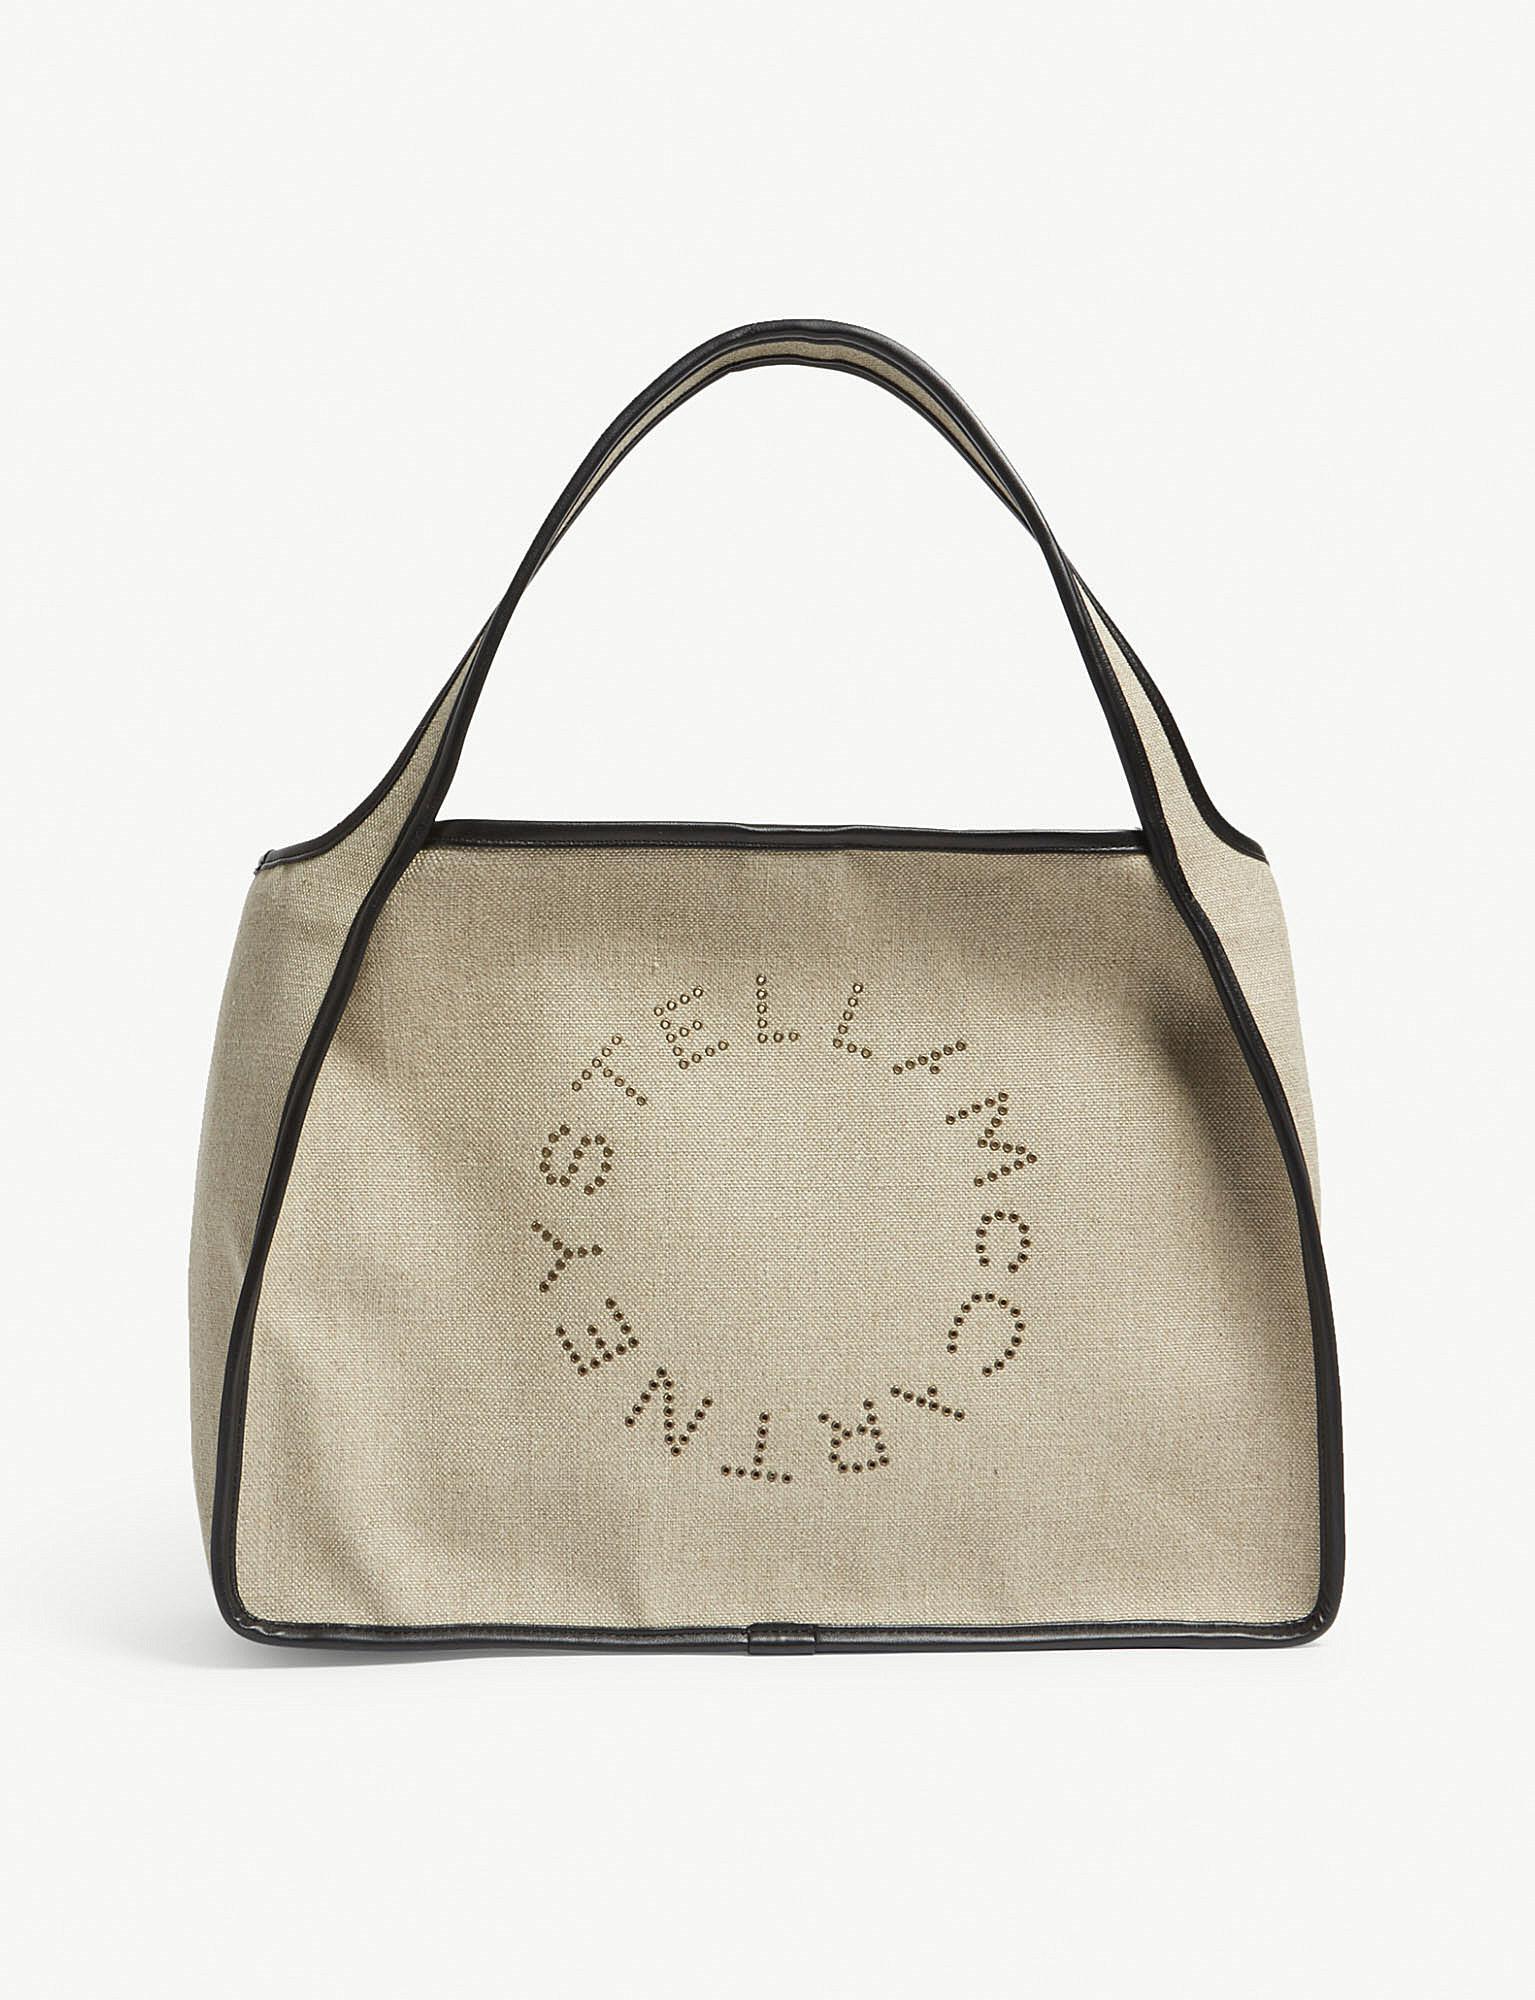 Stella McCartney Stella logo grommet-embellished tote Professional Online Largest Supplier Sale Online Sale For Nice 3bPC4qft